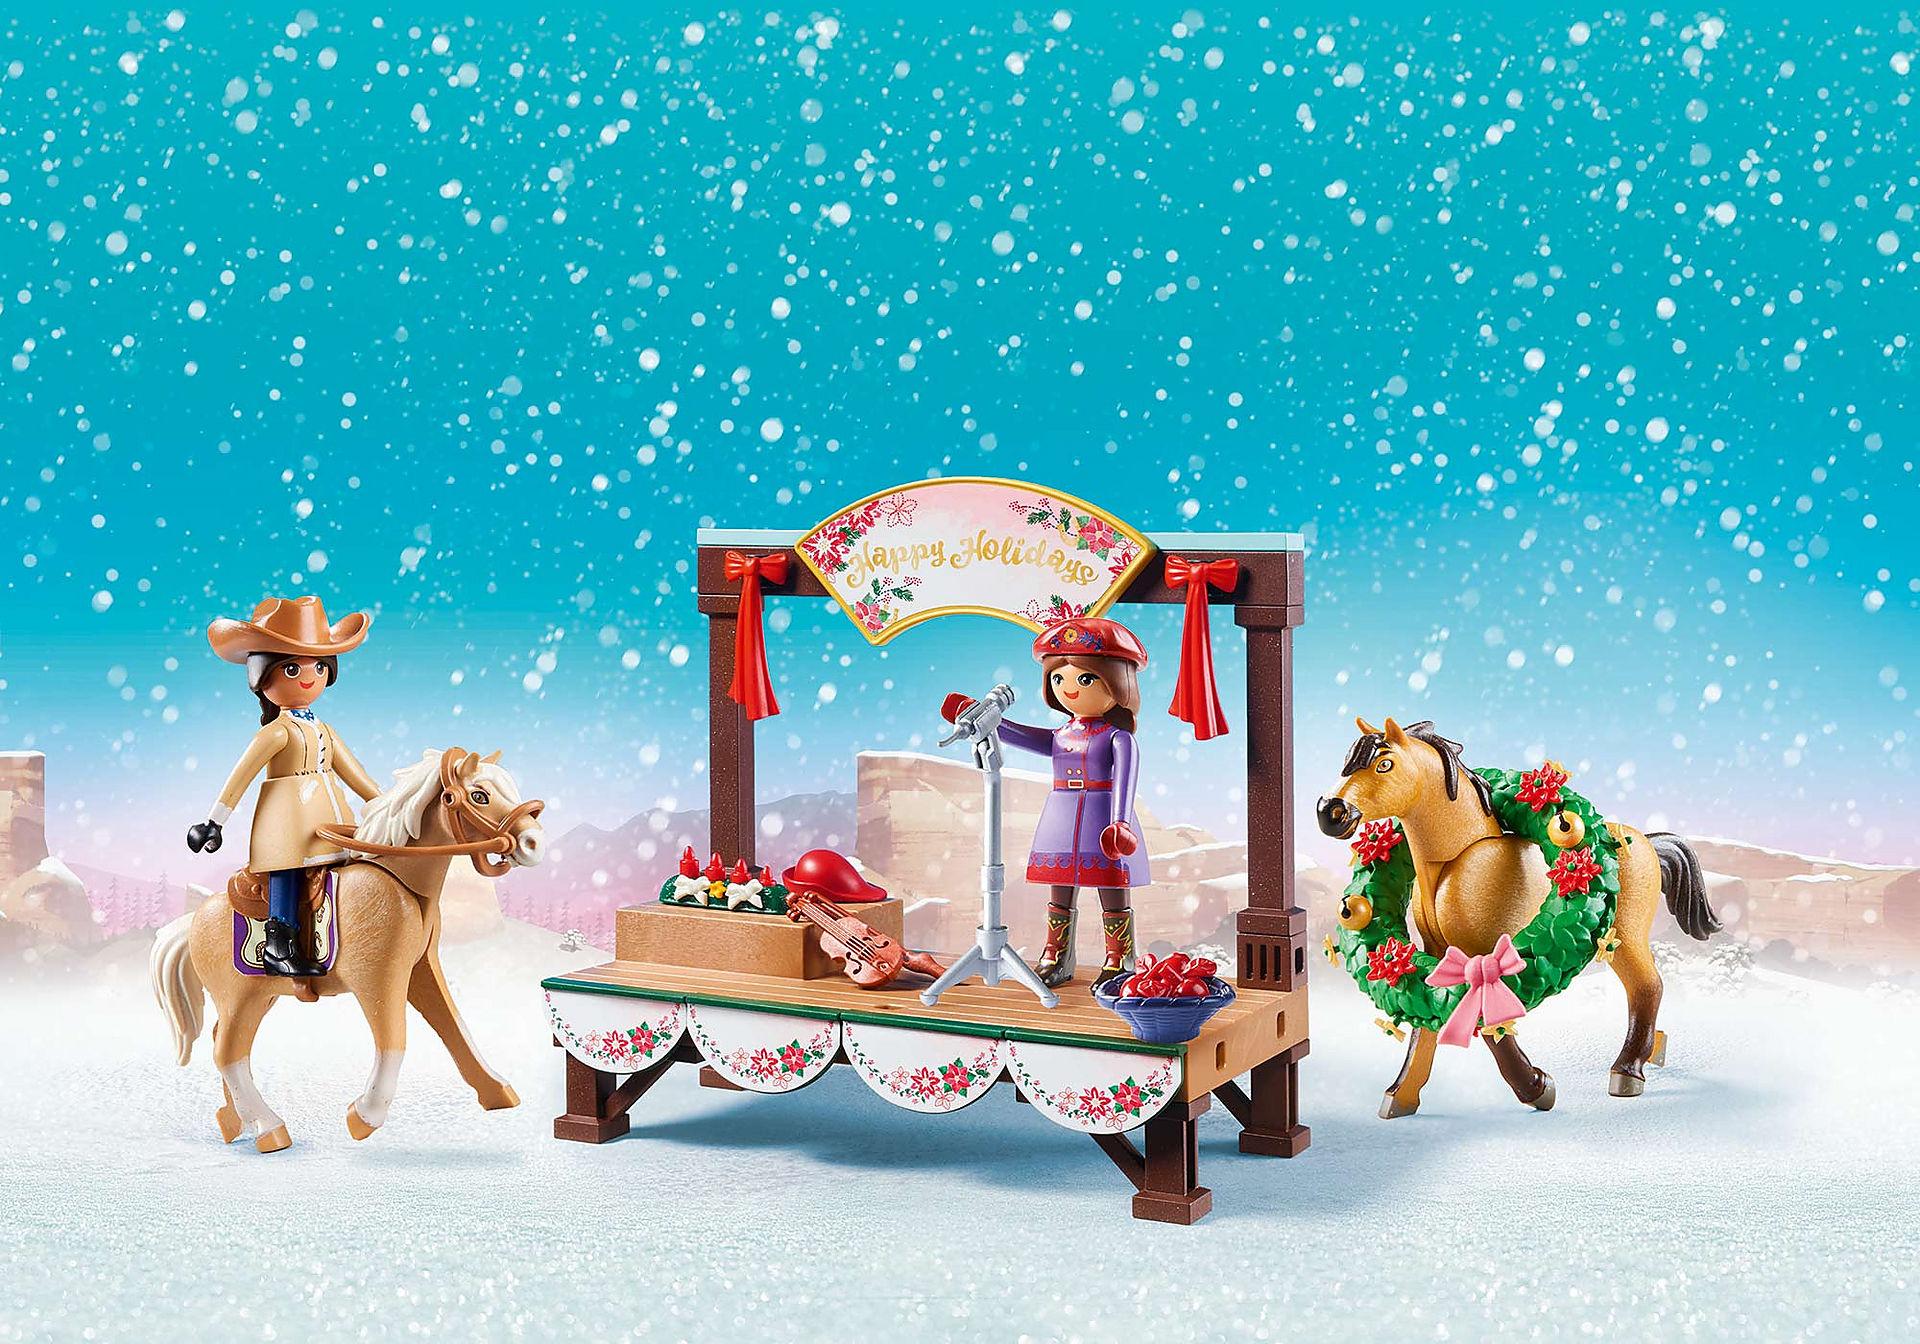 70396 Christmas Concert zoom image1